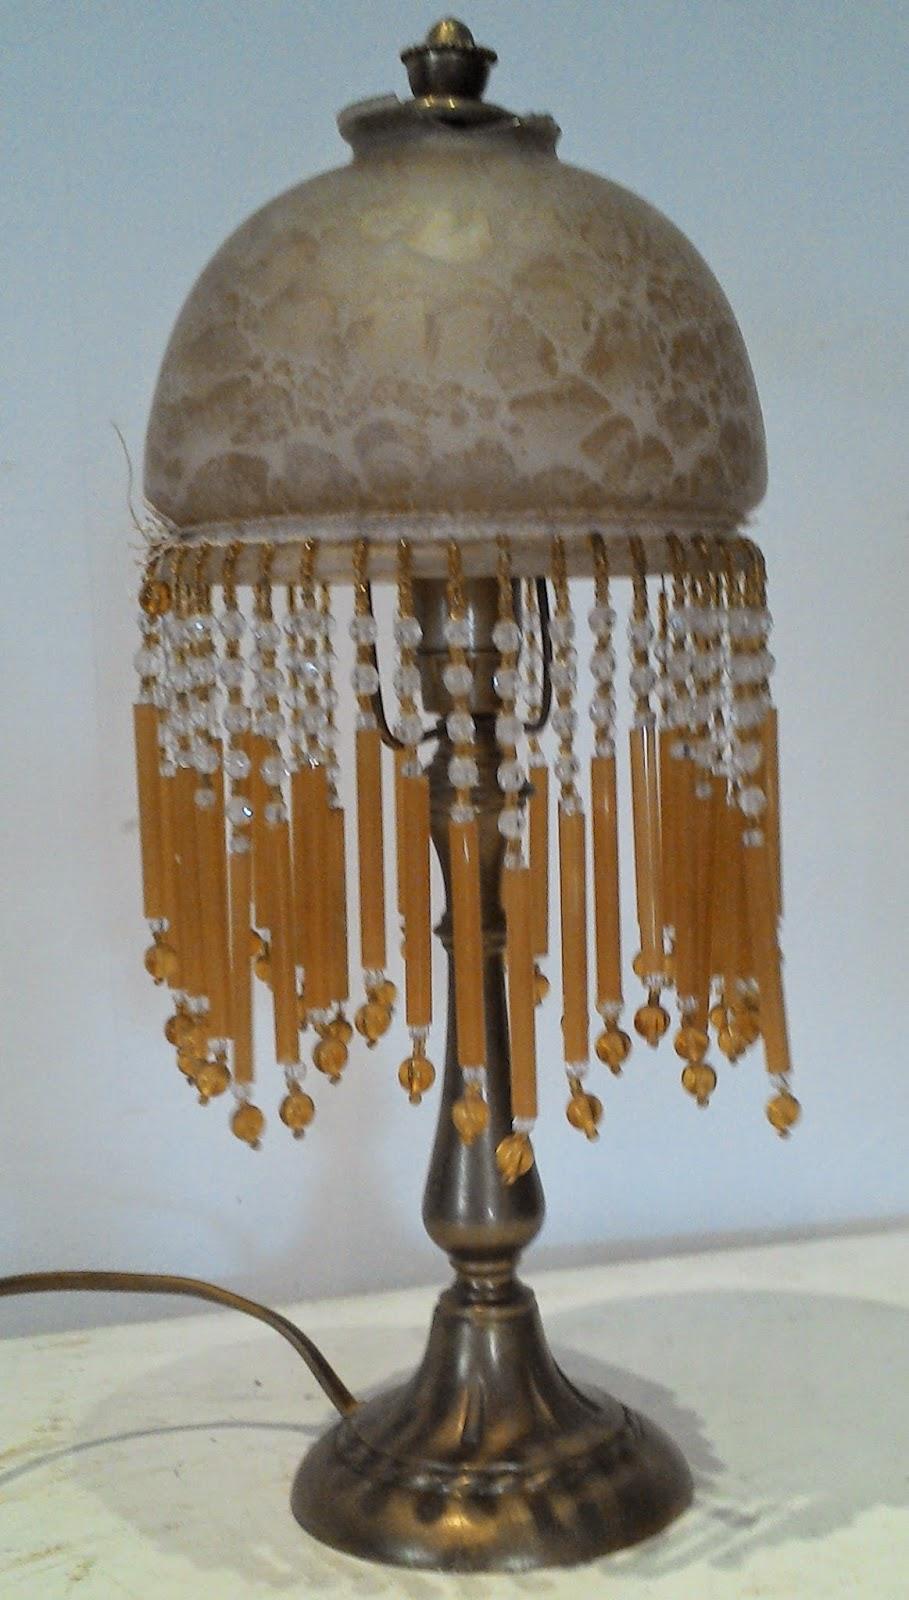 lampe champignon epoque art nouveau descente de perles globe pate de verre. Black Bedroom Furniture Sets. Home Design Ideas